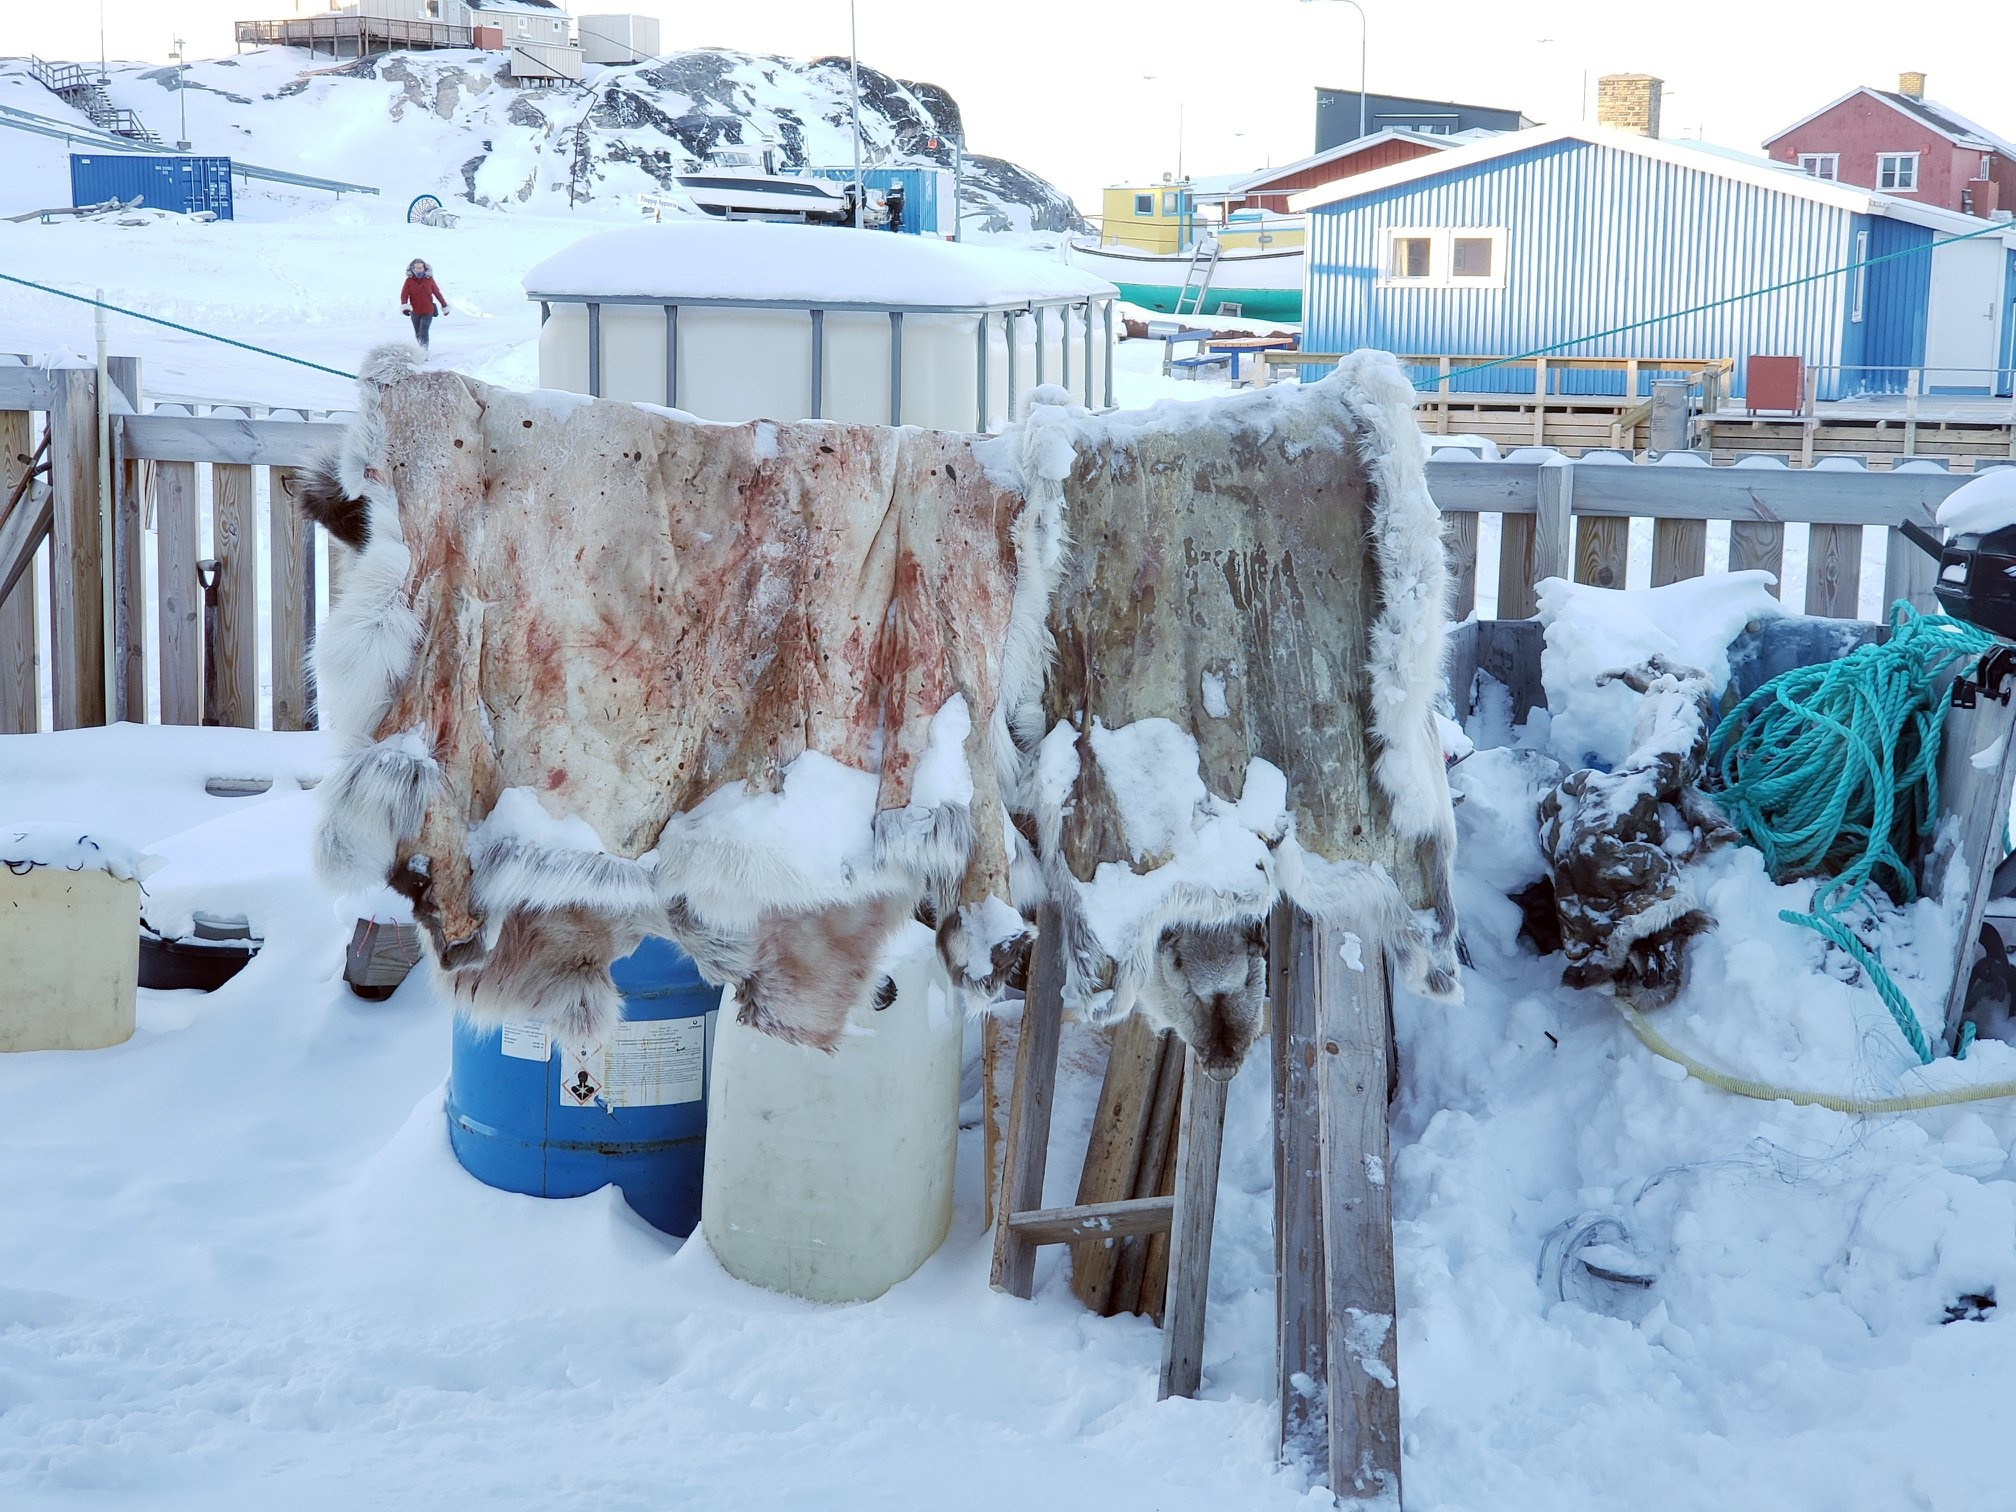 Cau chuyen Greenland va vung dat cuc Bac bi lang quen hinh anh 26